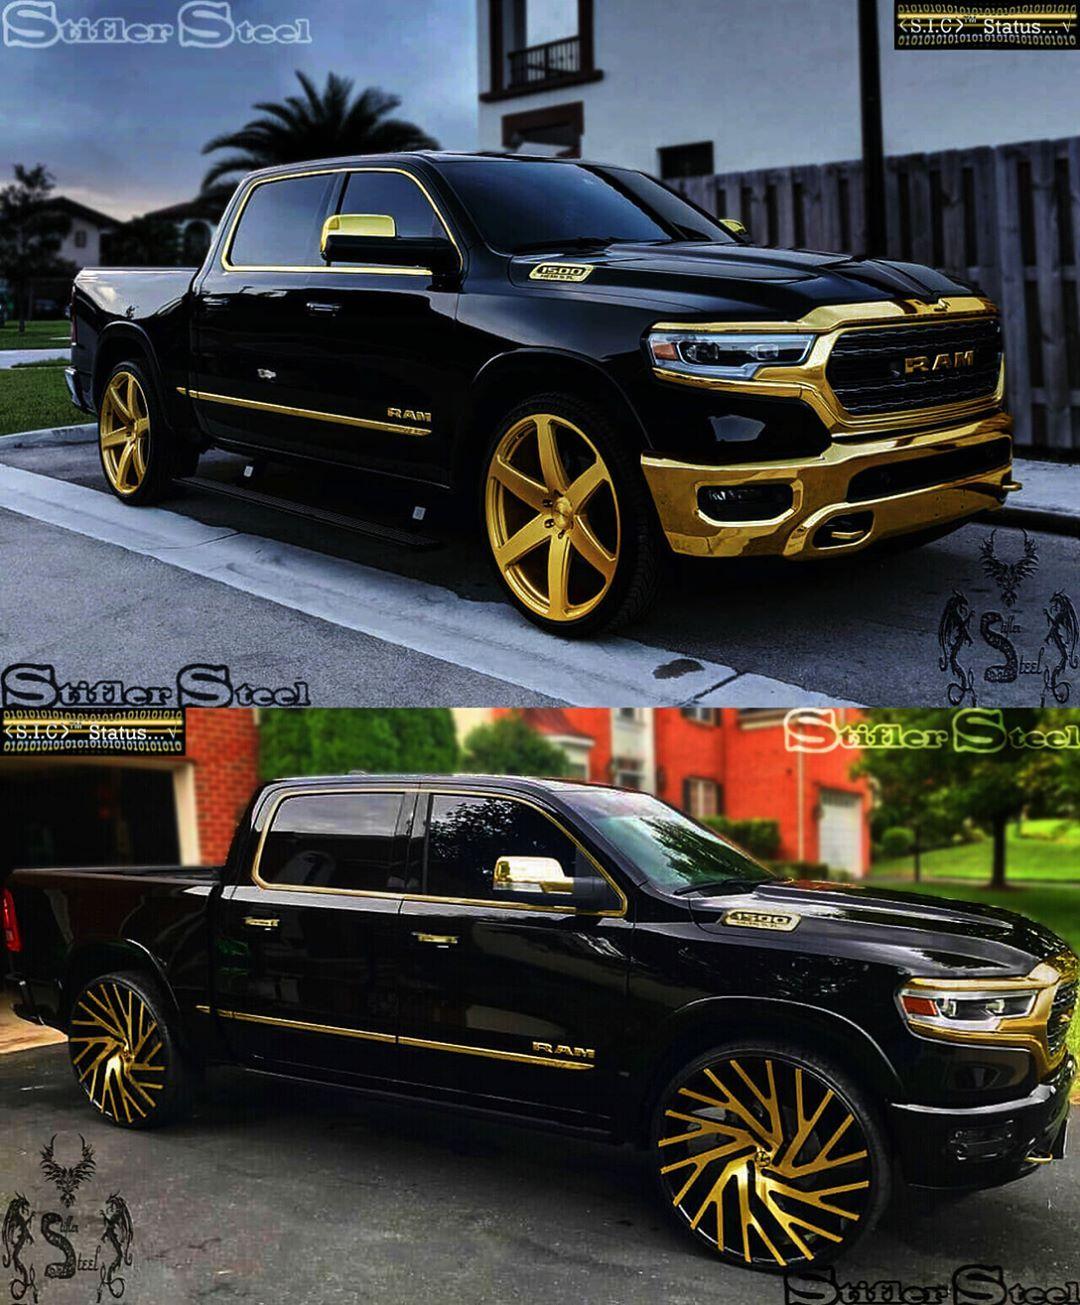 Dodge Ram On 26s : dodge, Image, Contain:, Outdoor, Custom, Trucks,, Lowrider, Dodge, Trucks